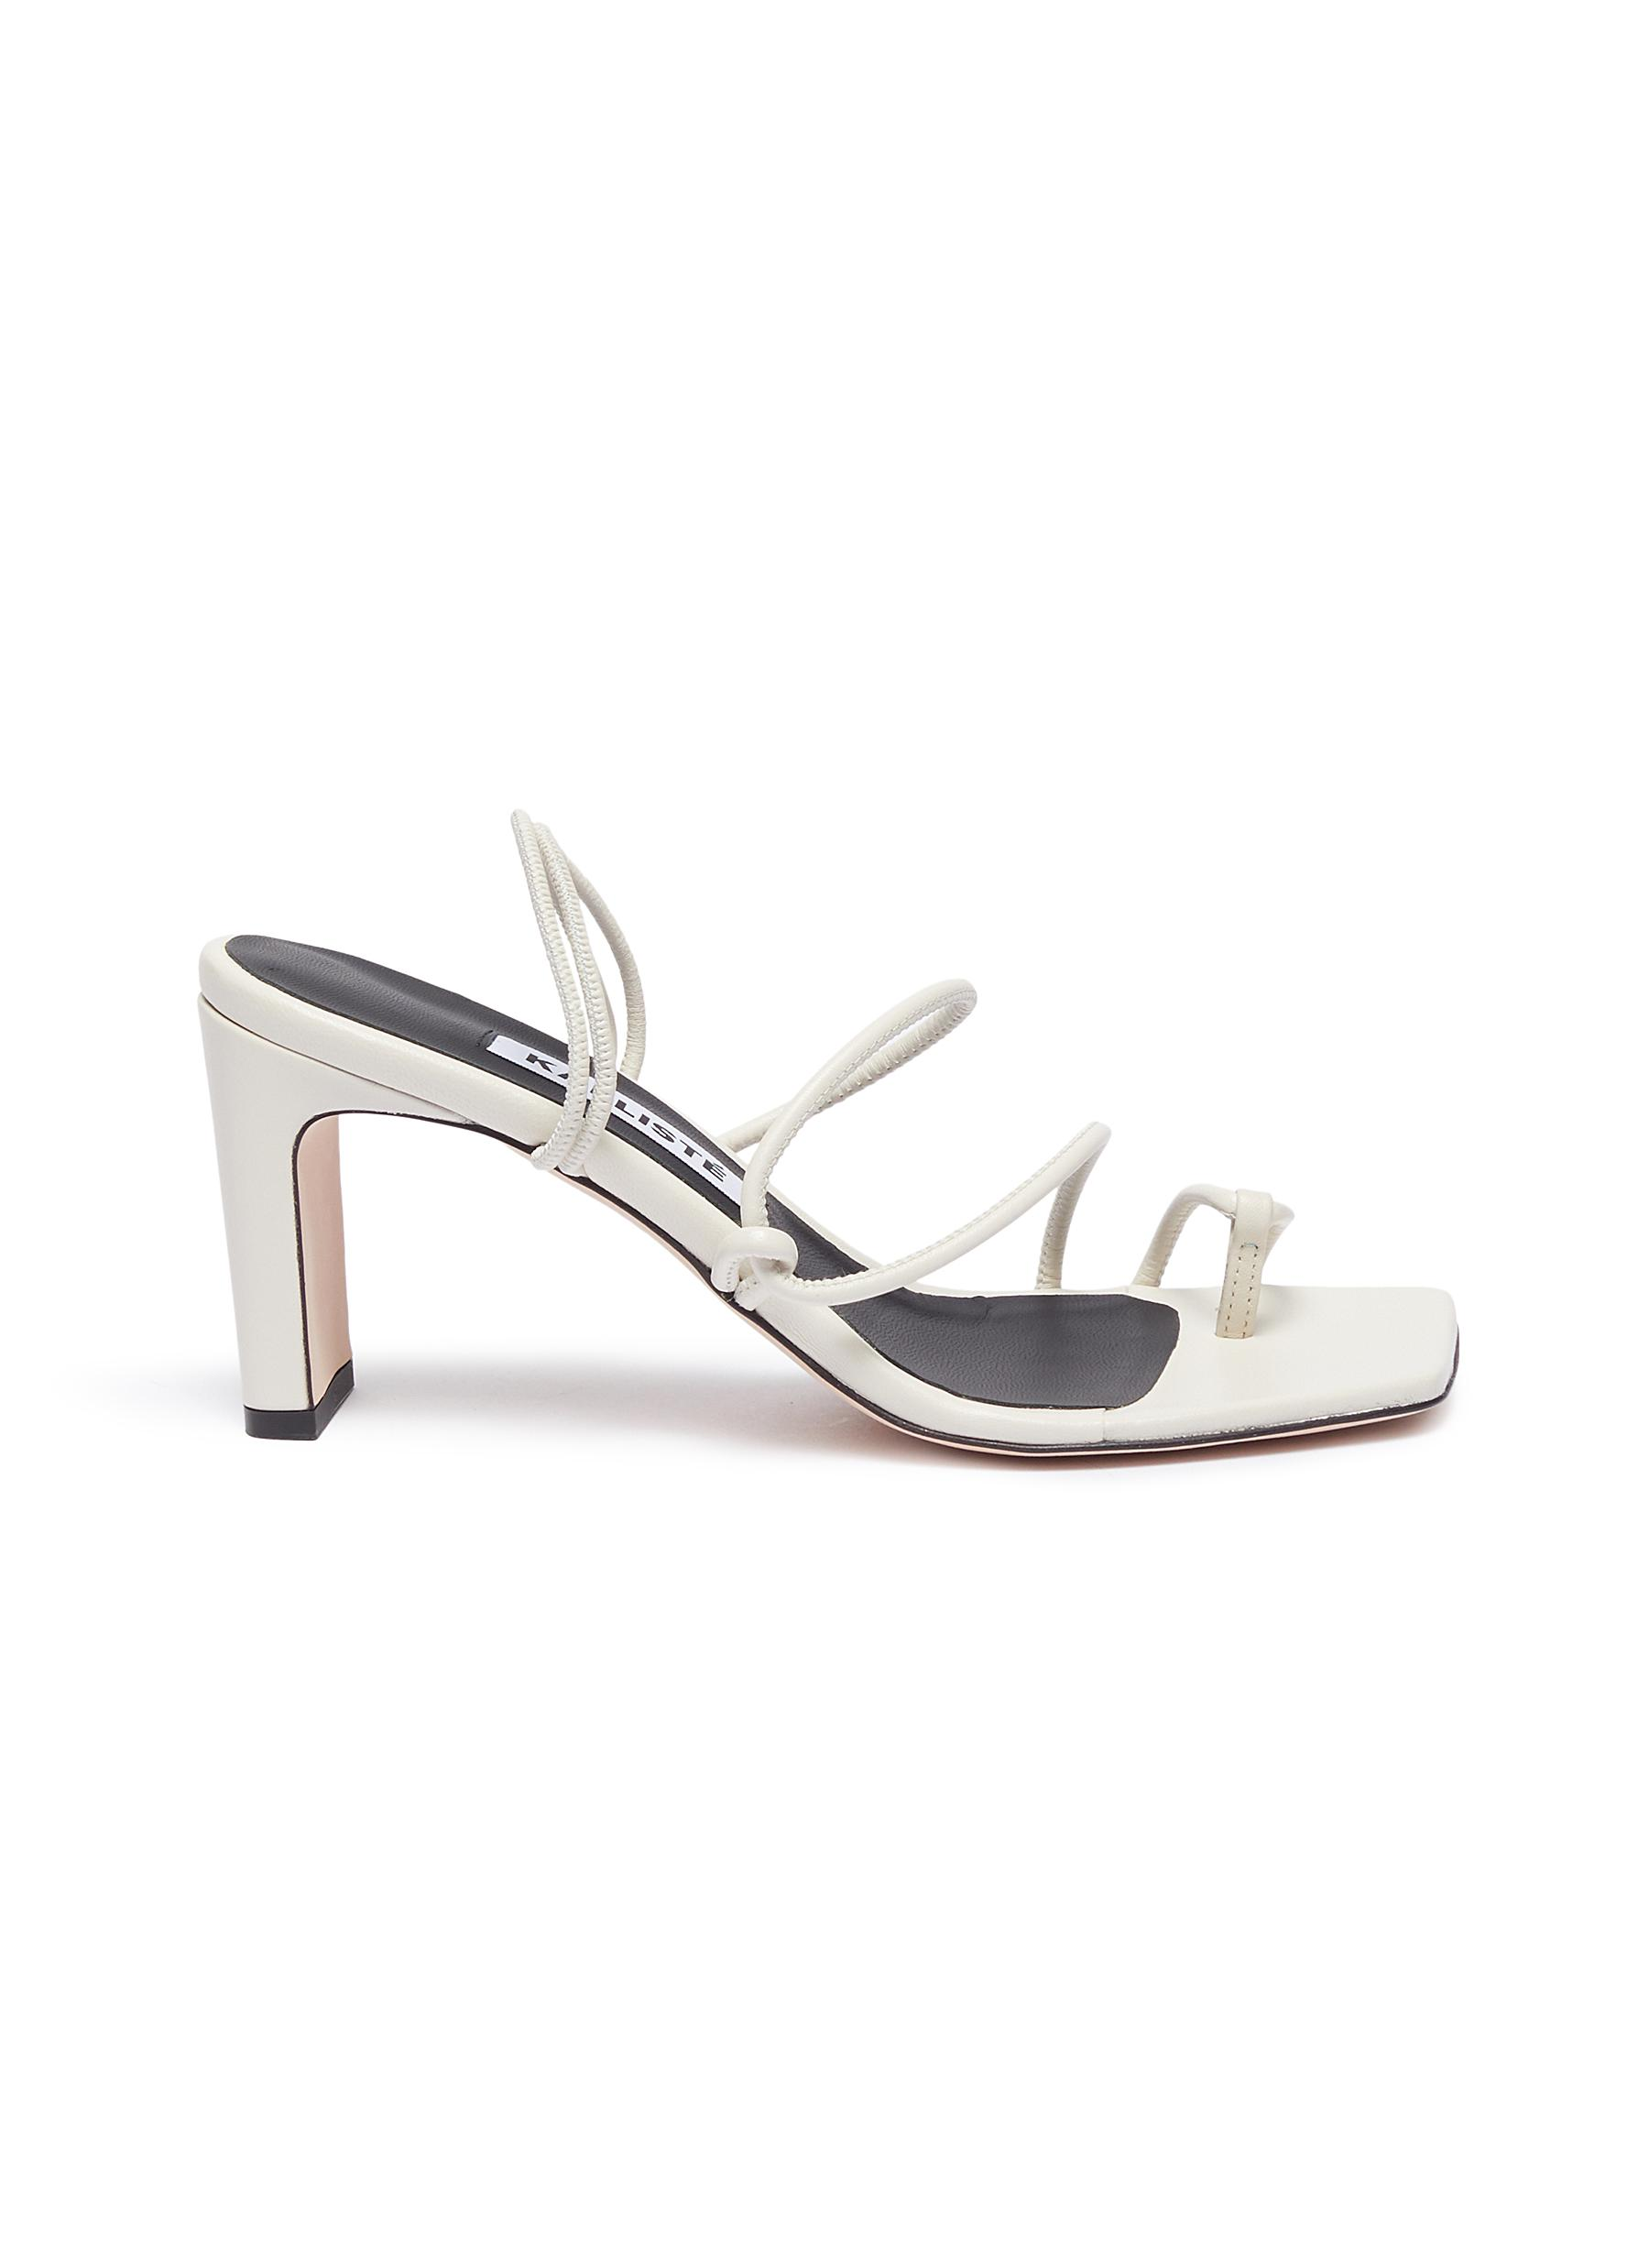 Kalliste Mid Heels Strappy Toe Ring Slingback Sandals